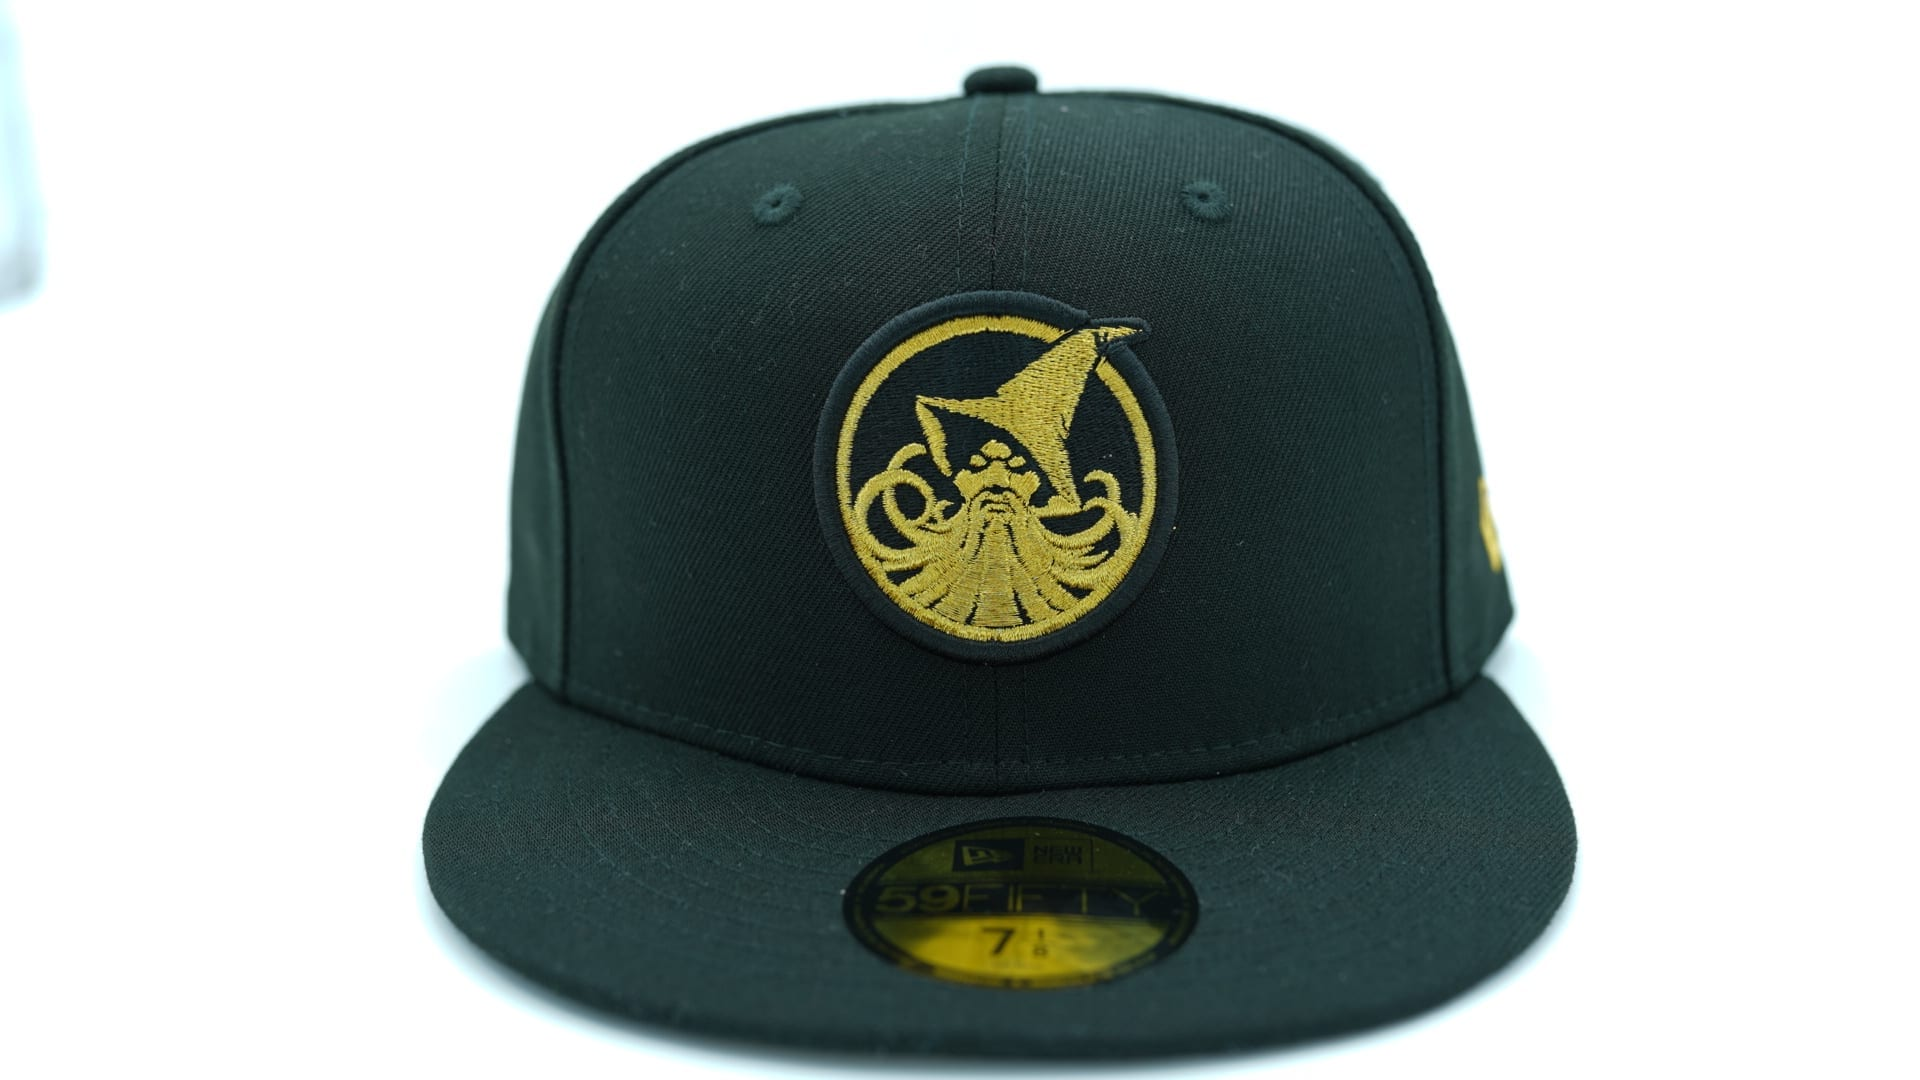 5e4b74c27c0f2 ... discount code for new york yankees hat logo gold 59fifty fitted  baseball cap new era mlb